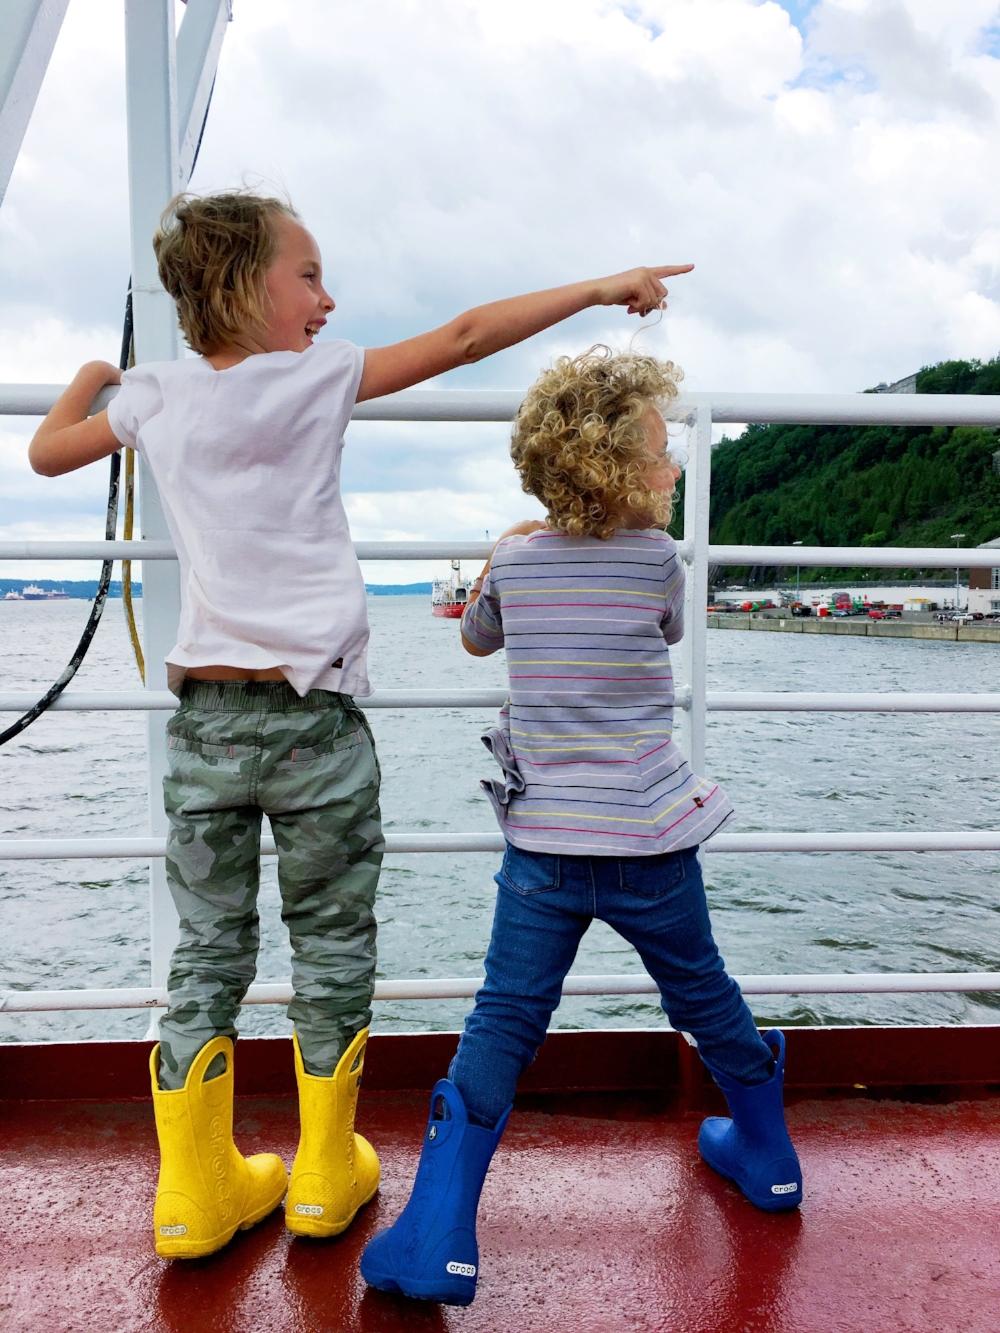 kids on boat quebec city.JPG